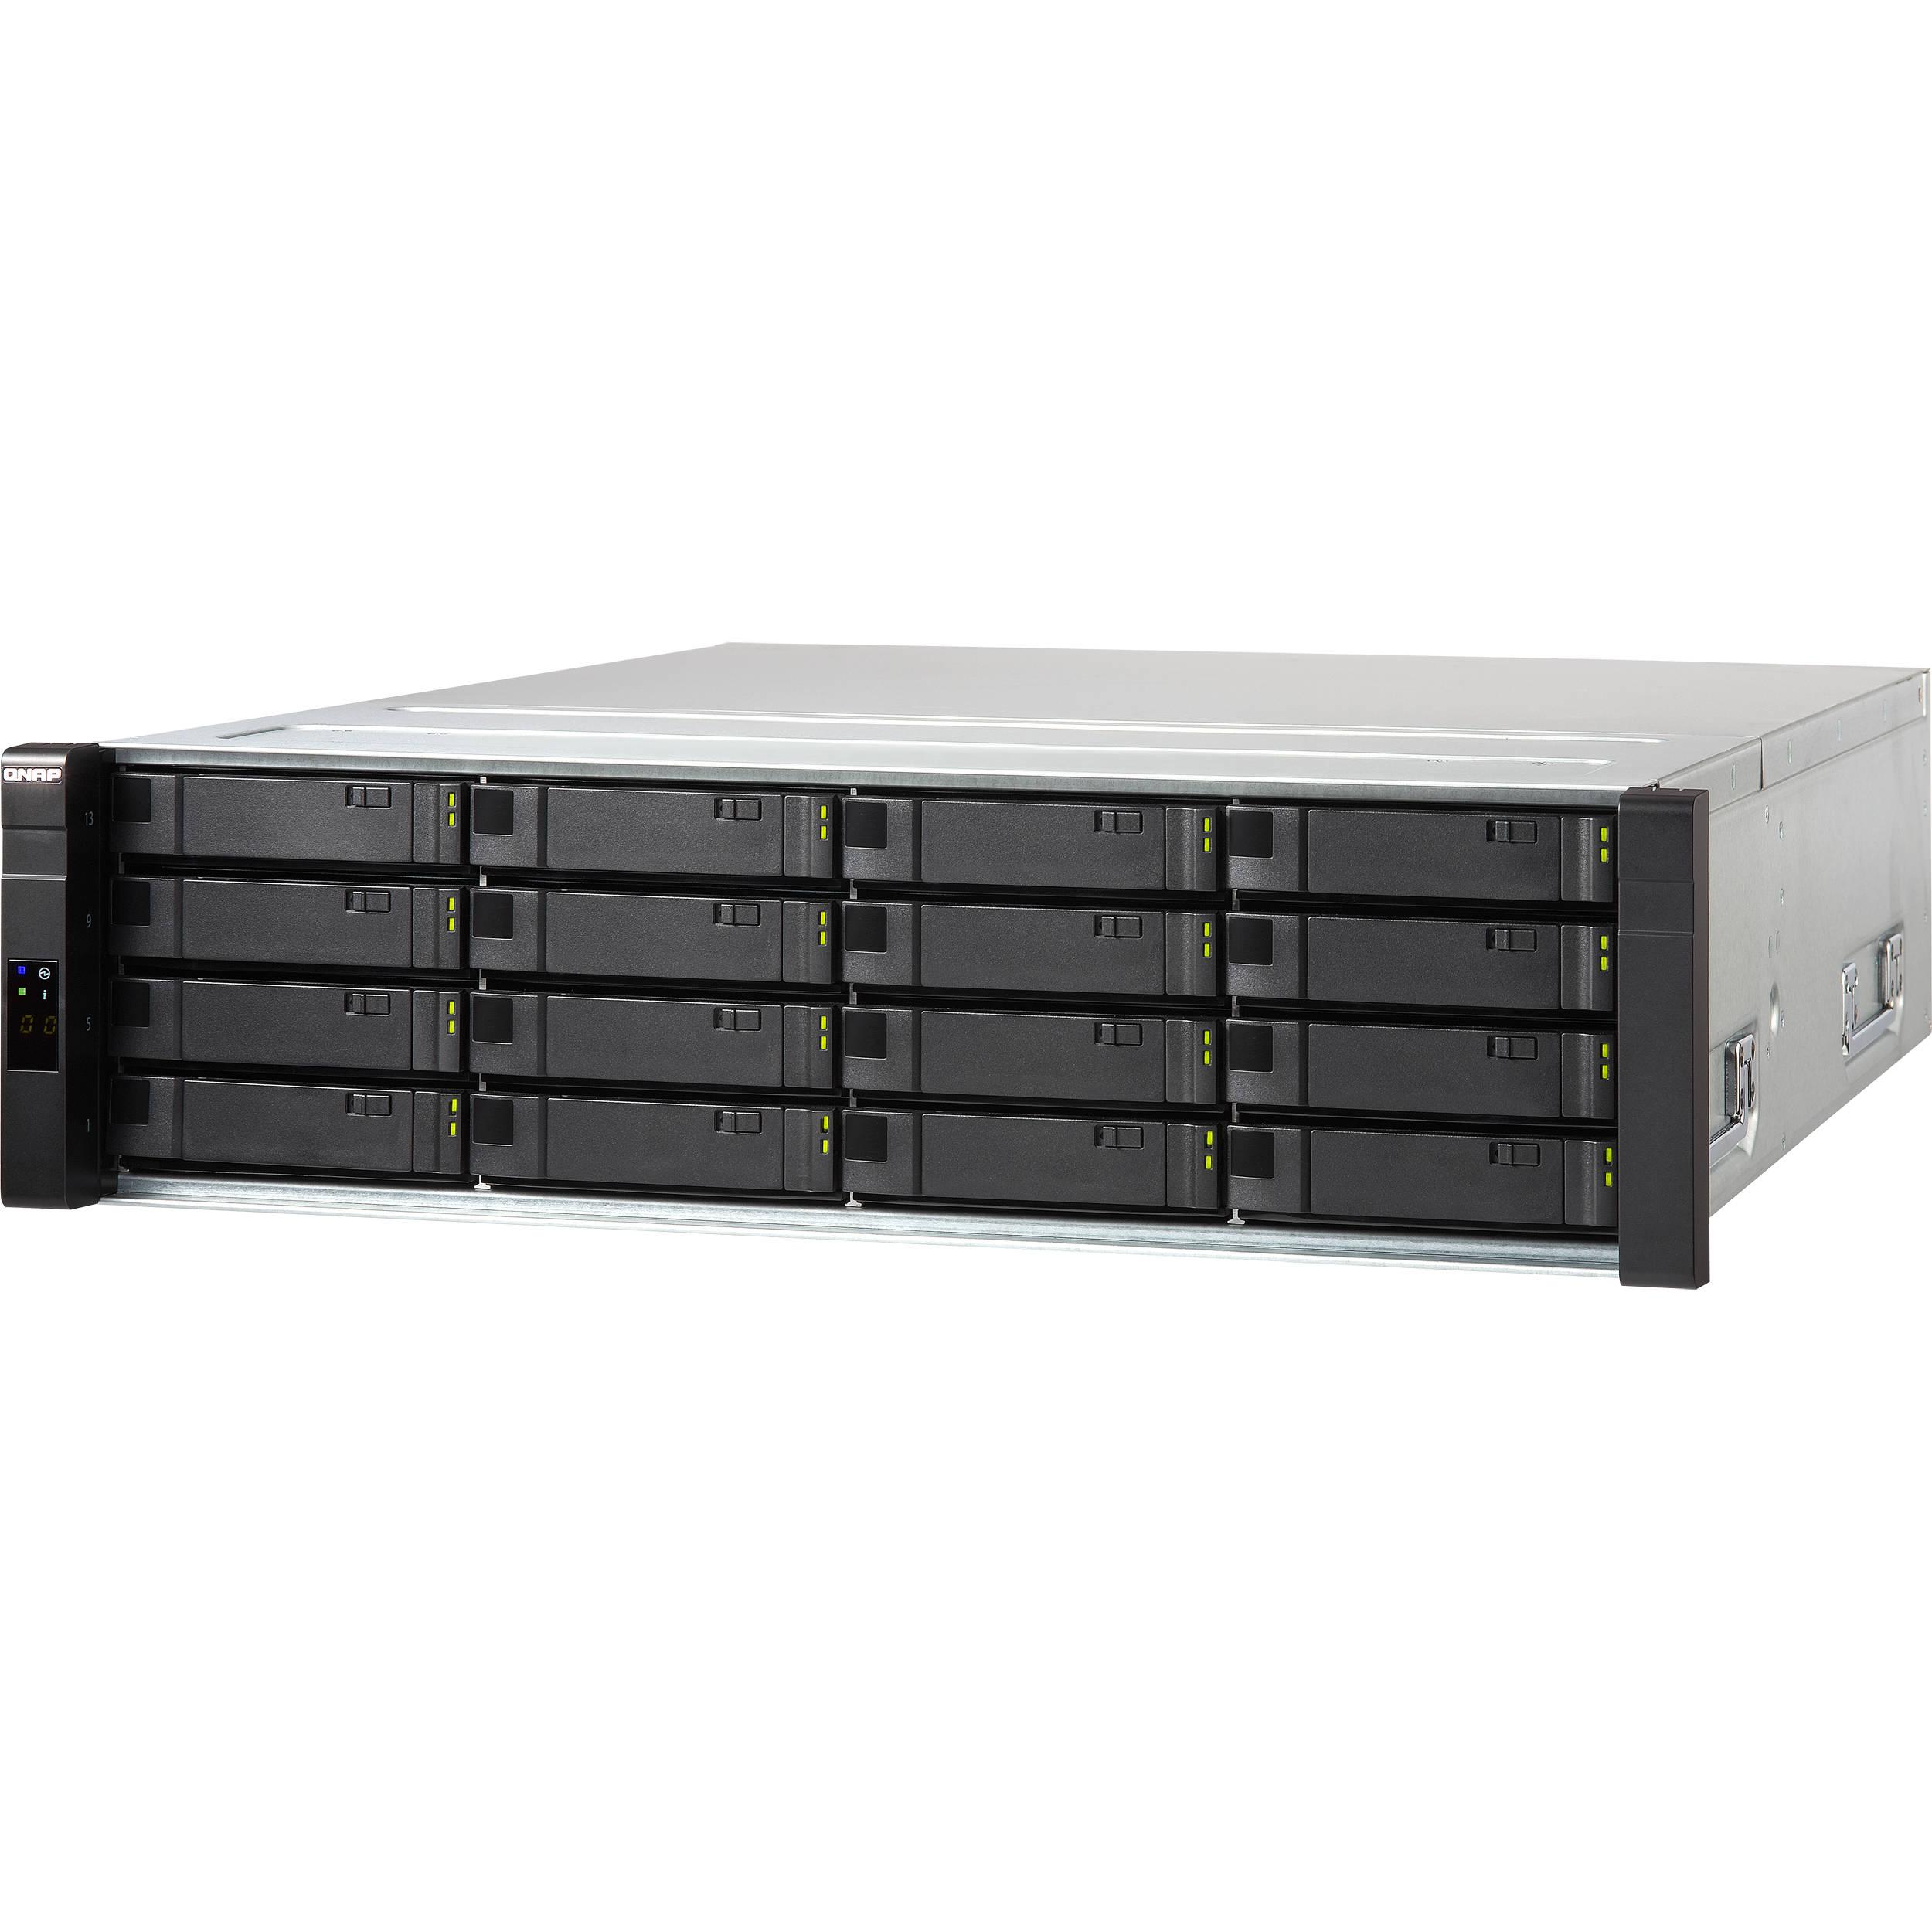 QNAP ES1640dc v2 16-Bay NAS Enclosure with Dual Active Controllers